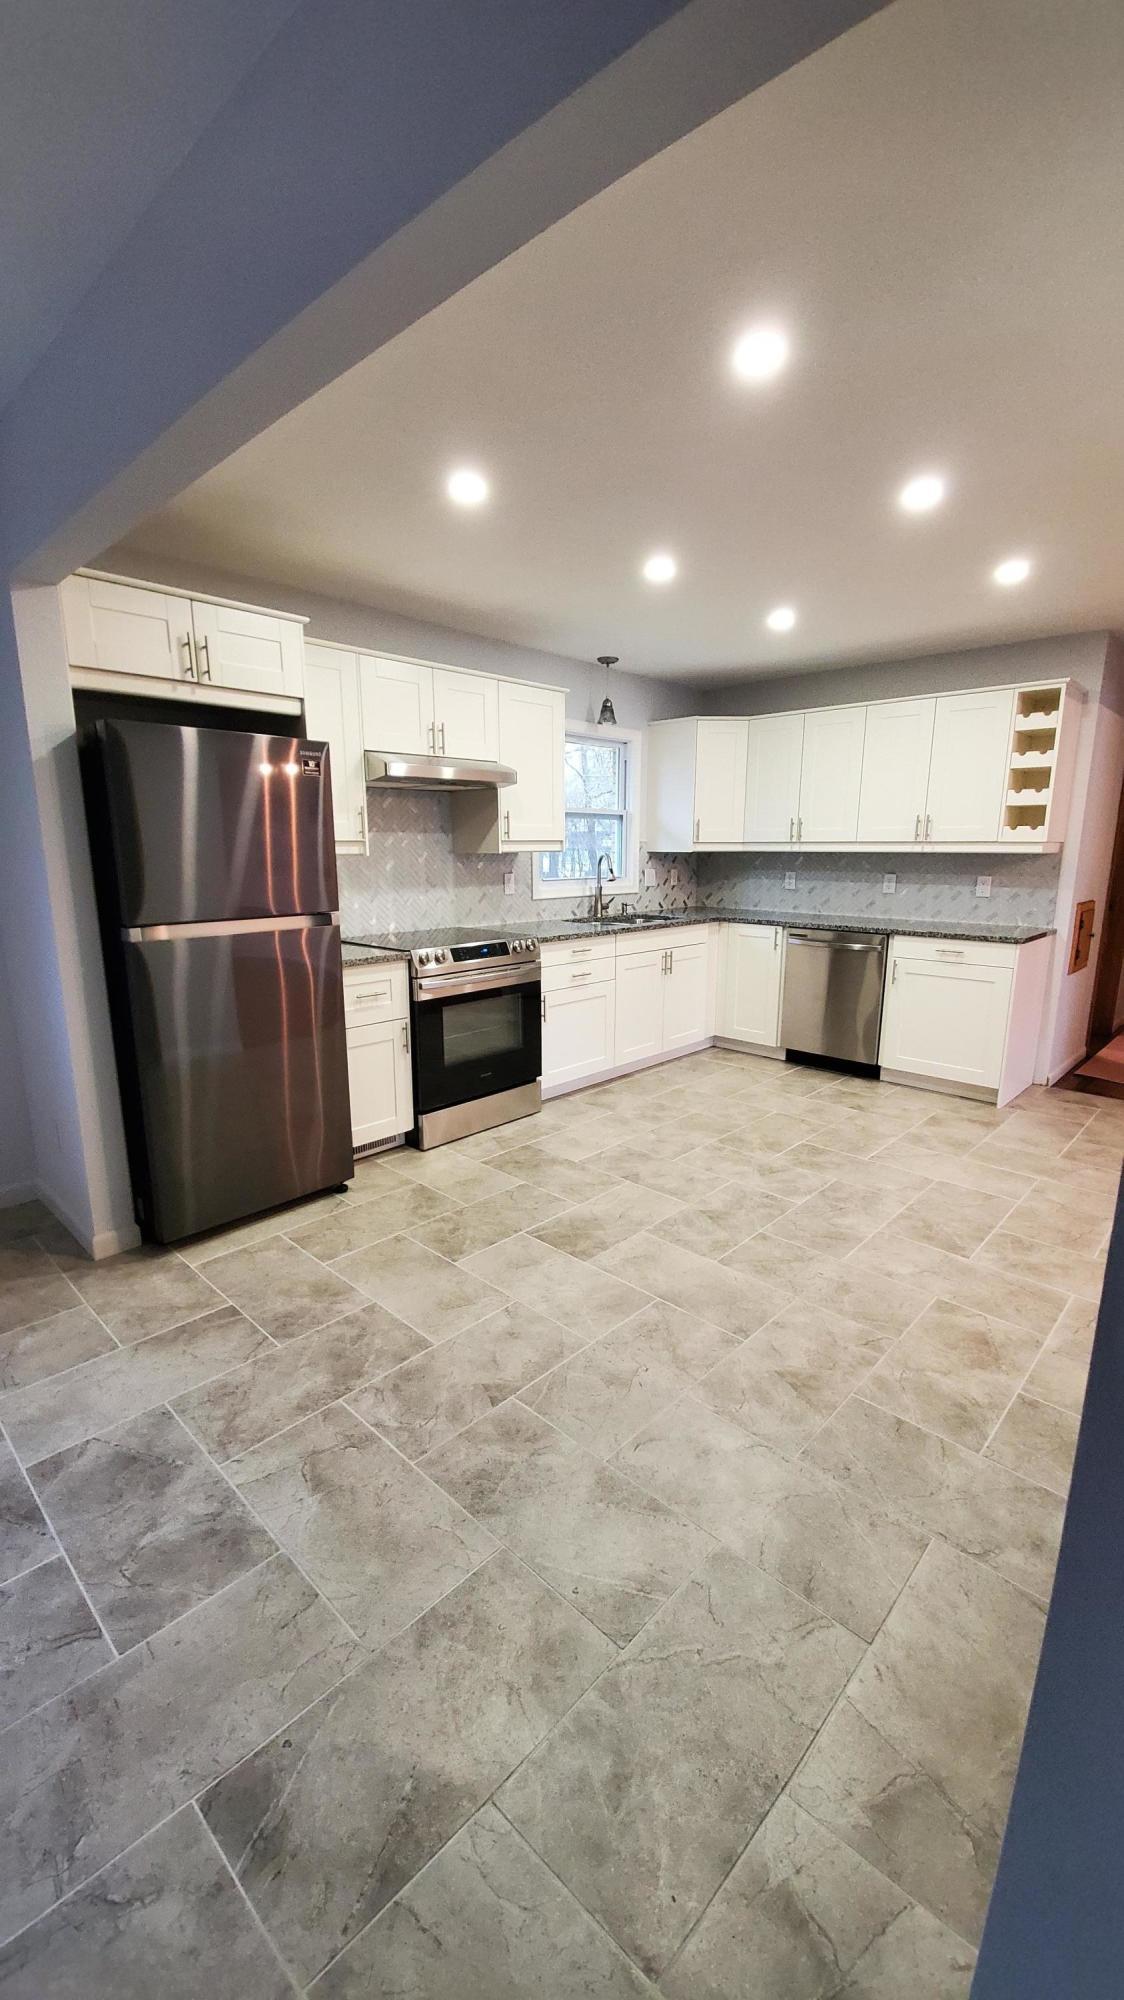 5460 Honey Creek Dr, Greenfield, Wisconsin 53221, 3 Bedrooms Bedrooms, ,1 BathroomBathrooms,Single-family,For Sale,Honey Creek Dr,1721993